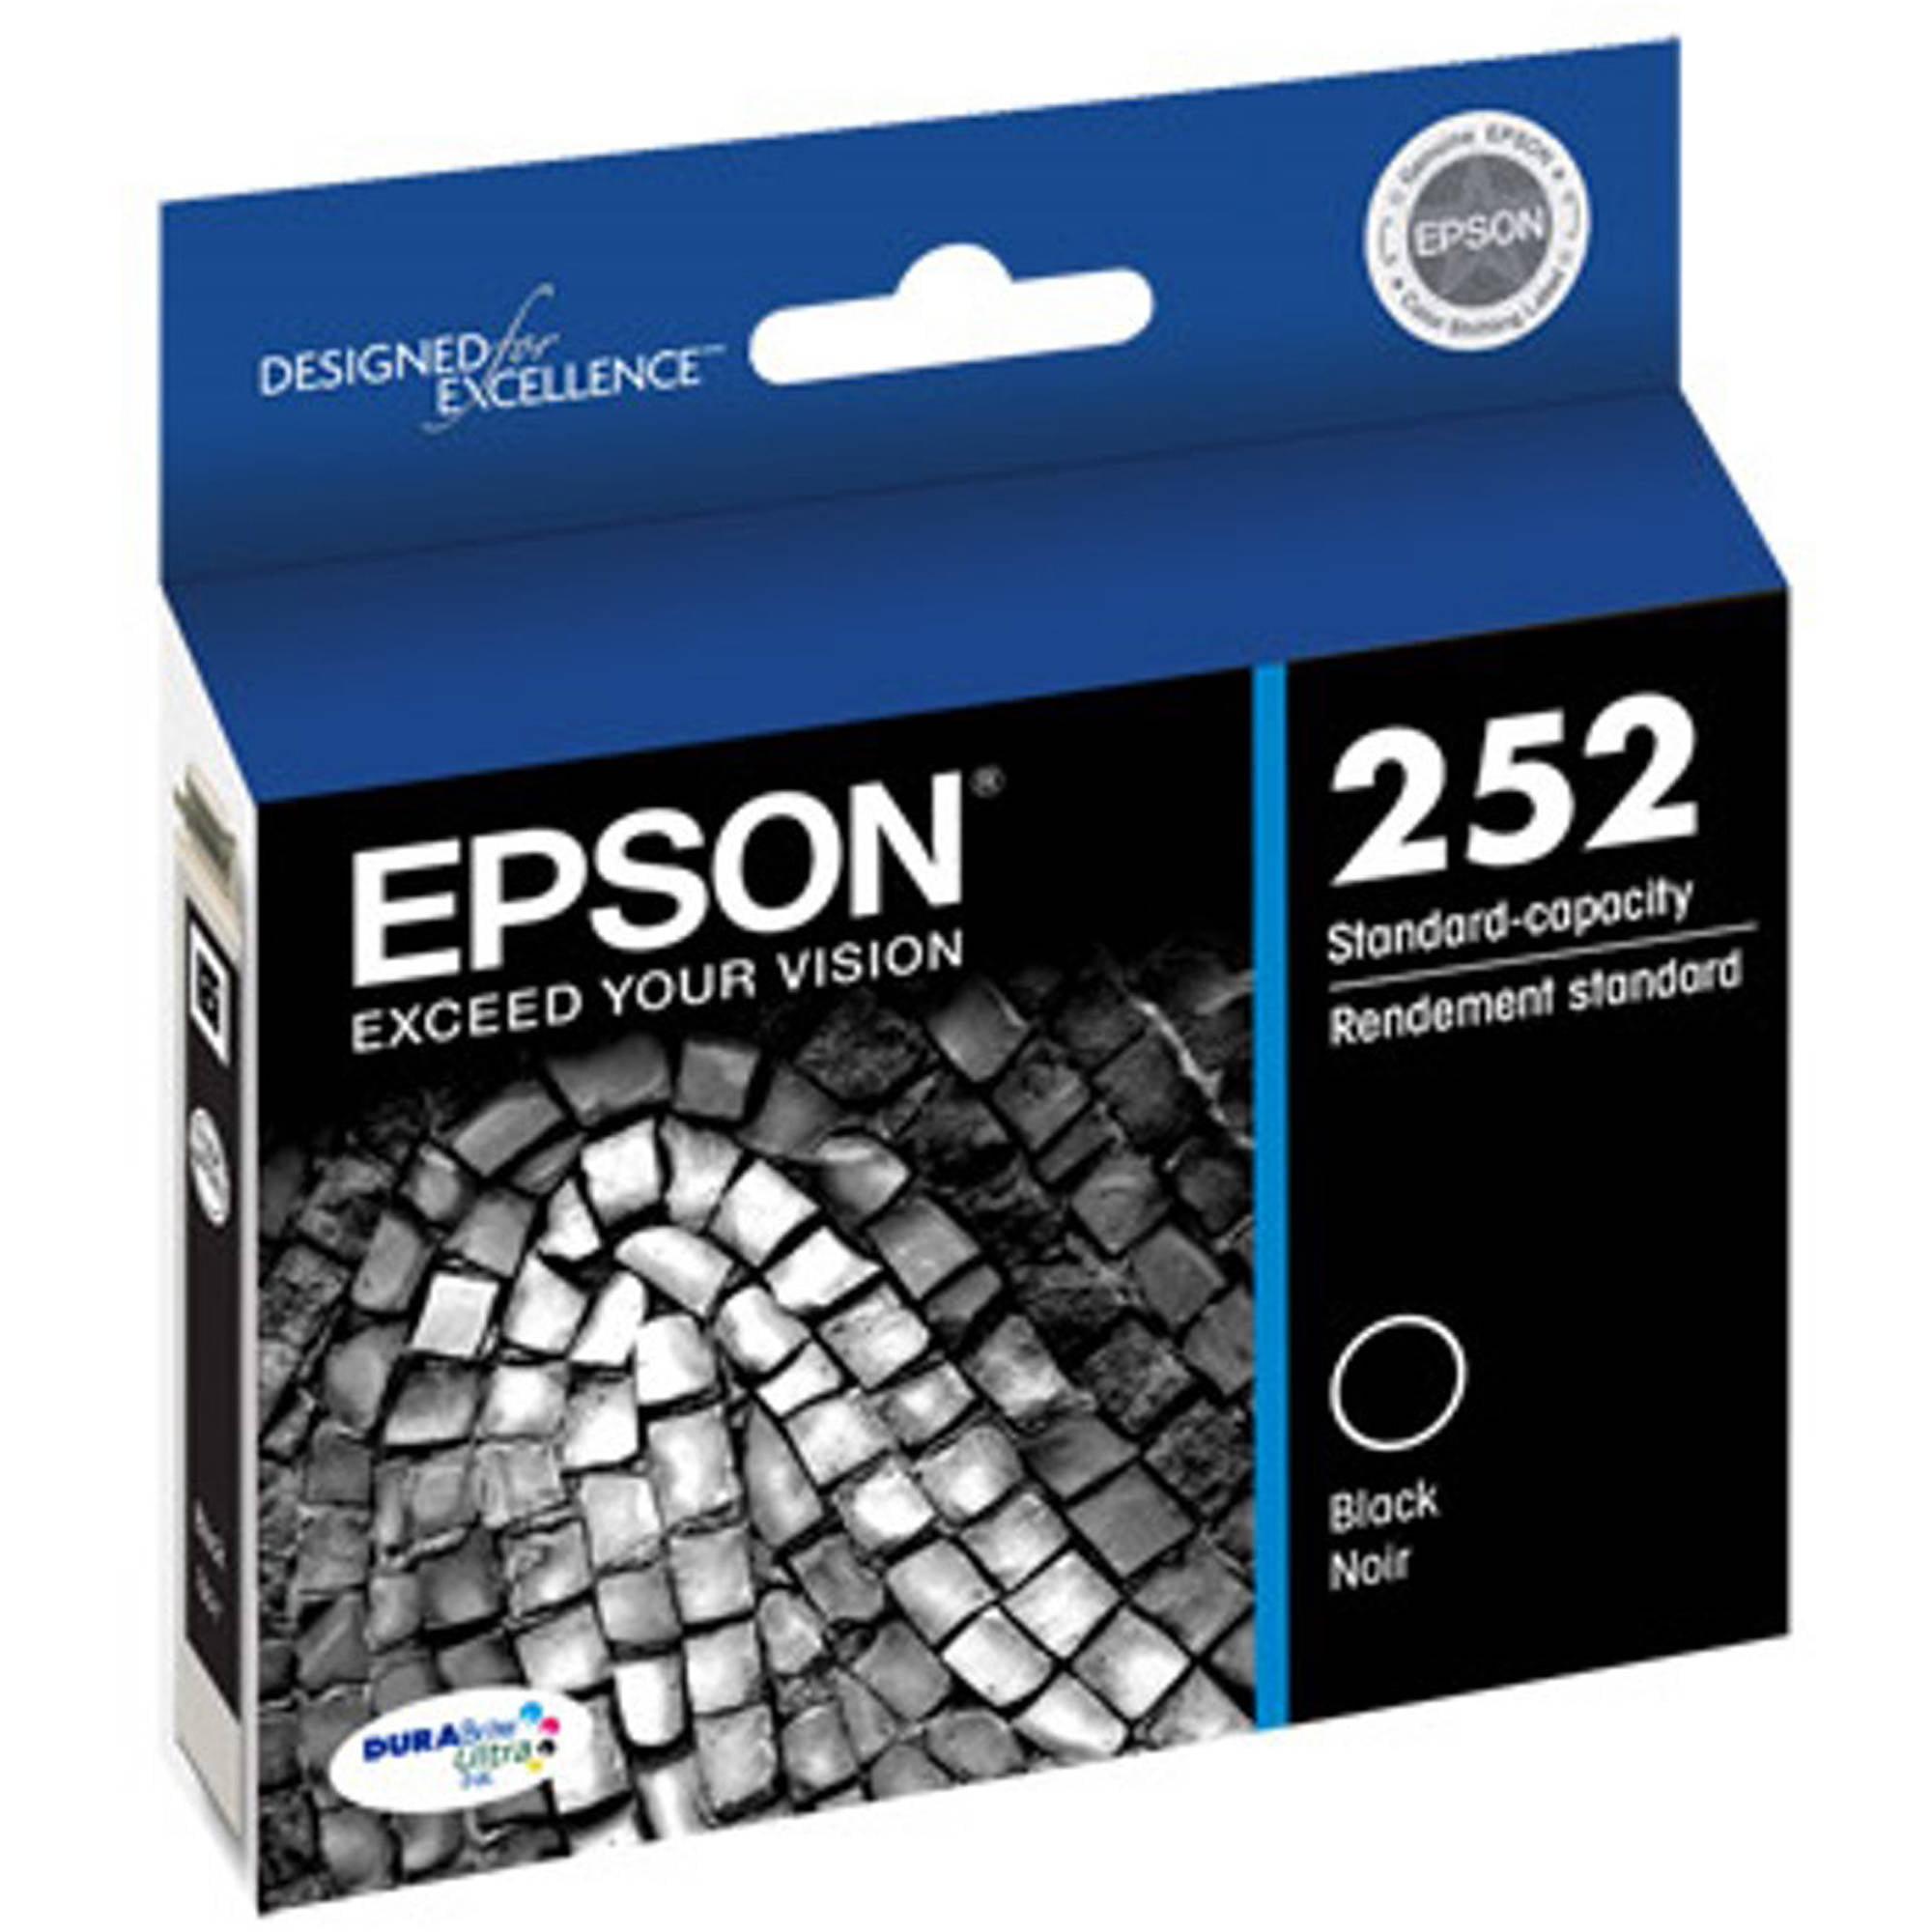 Epson T252 Standard-Capacity Black Ink Cartridge